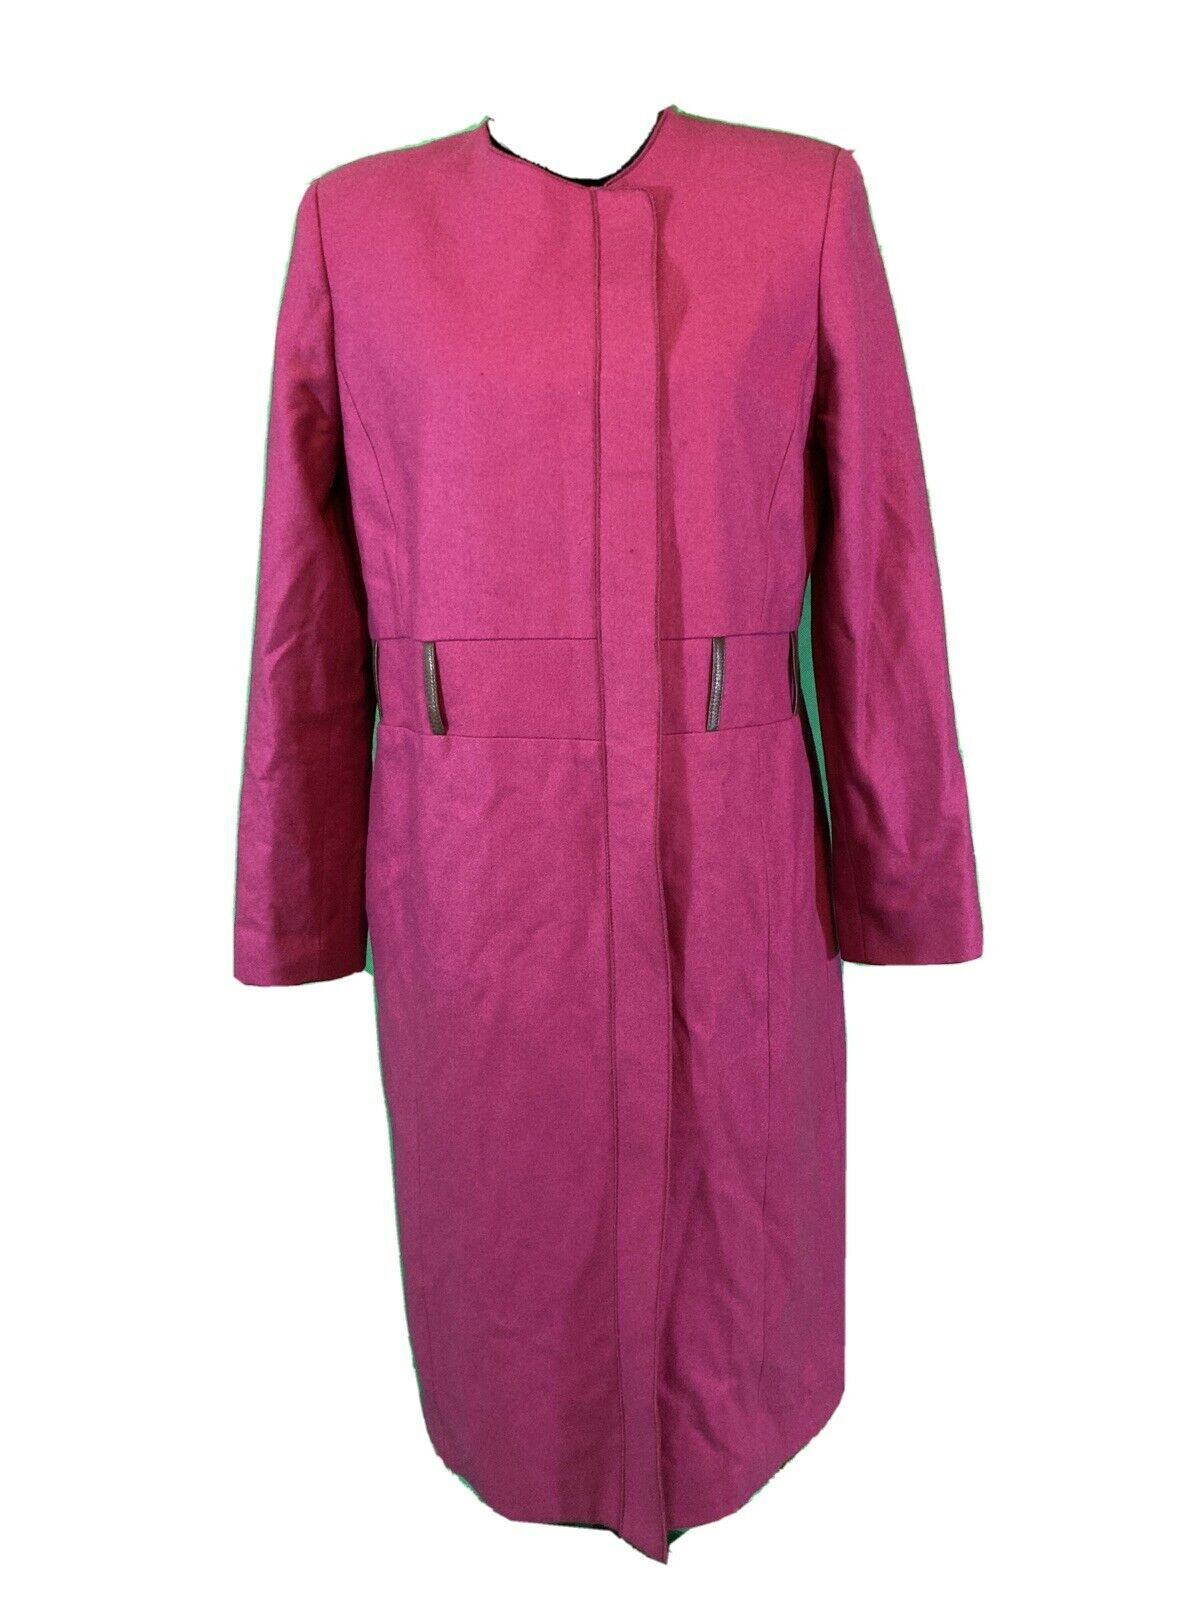 harve benard Coat Purple Sz 10 Button Down Wool Blend